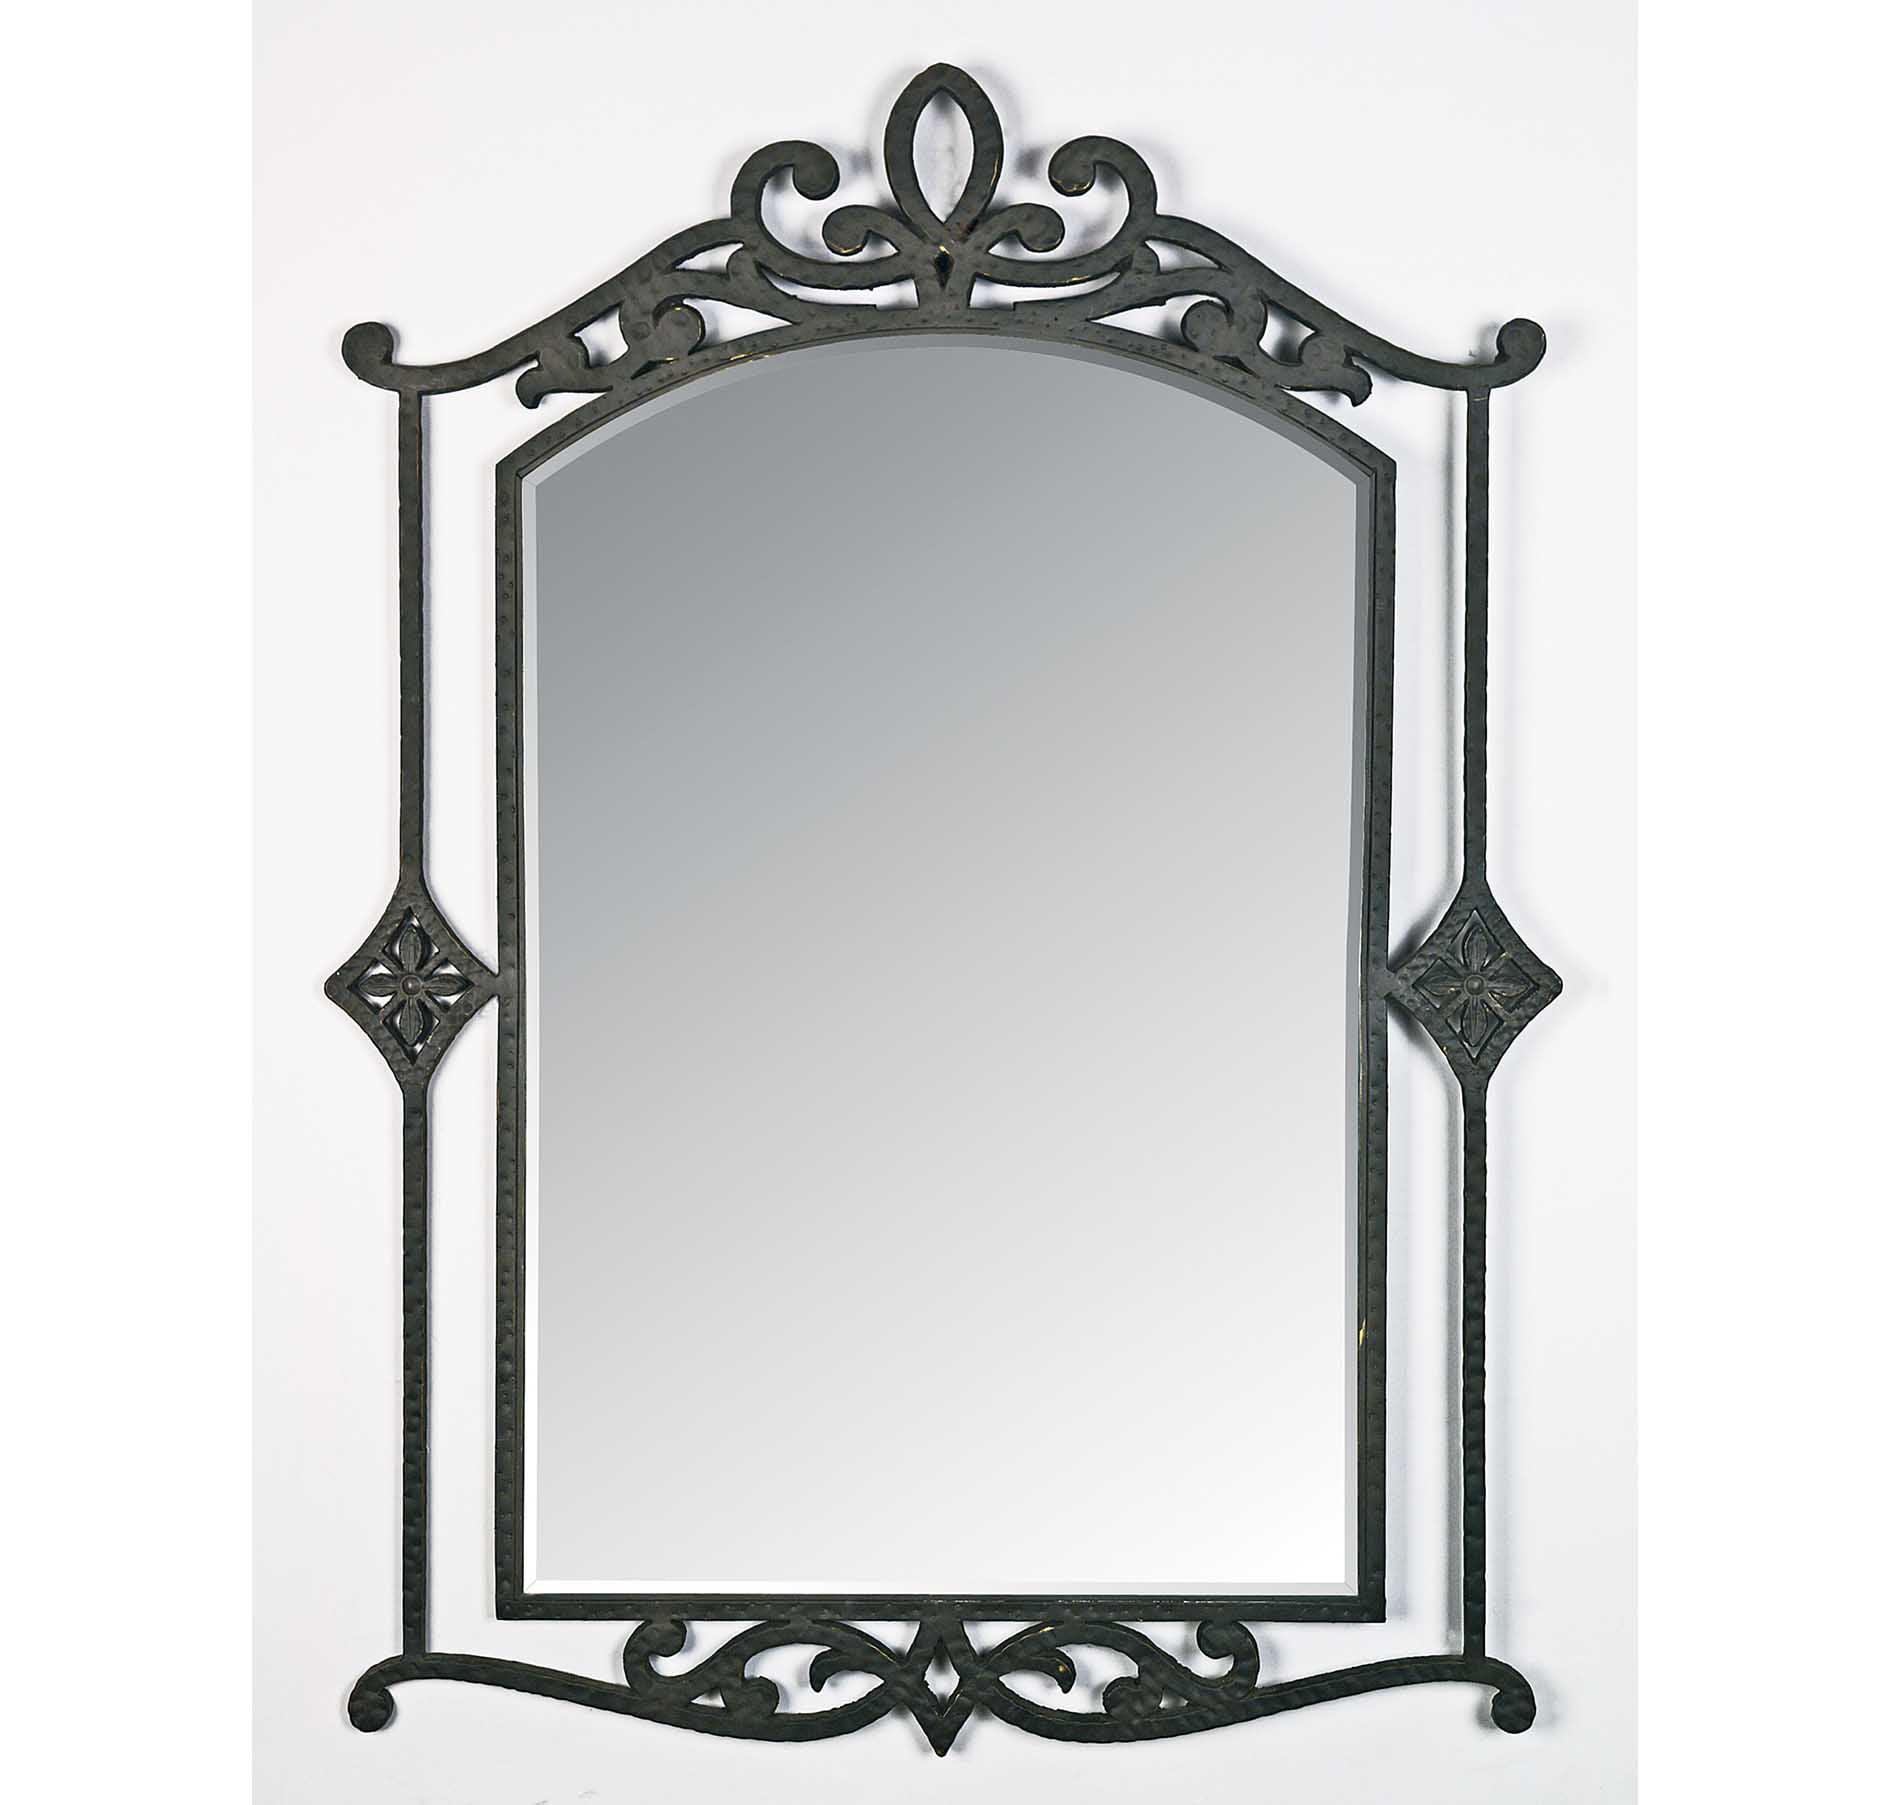 "Quoizel La Parra 29.5""W Mirror in Imperial Bronze"